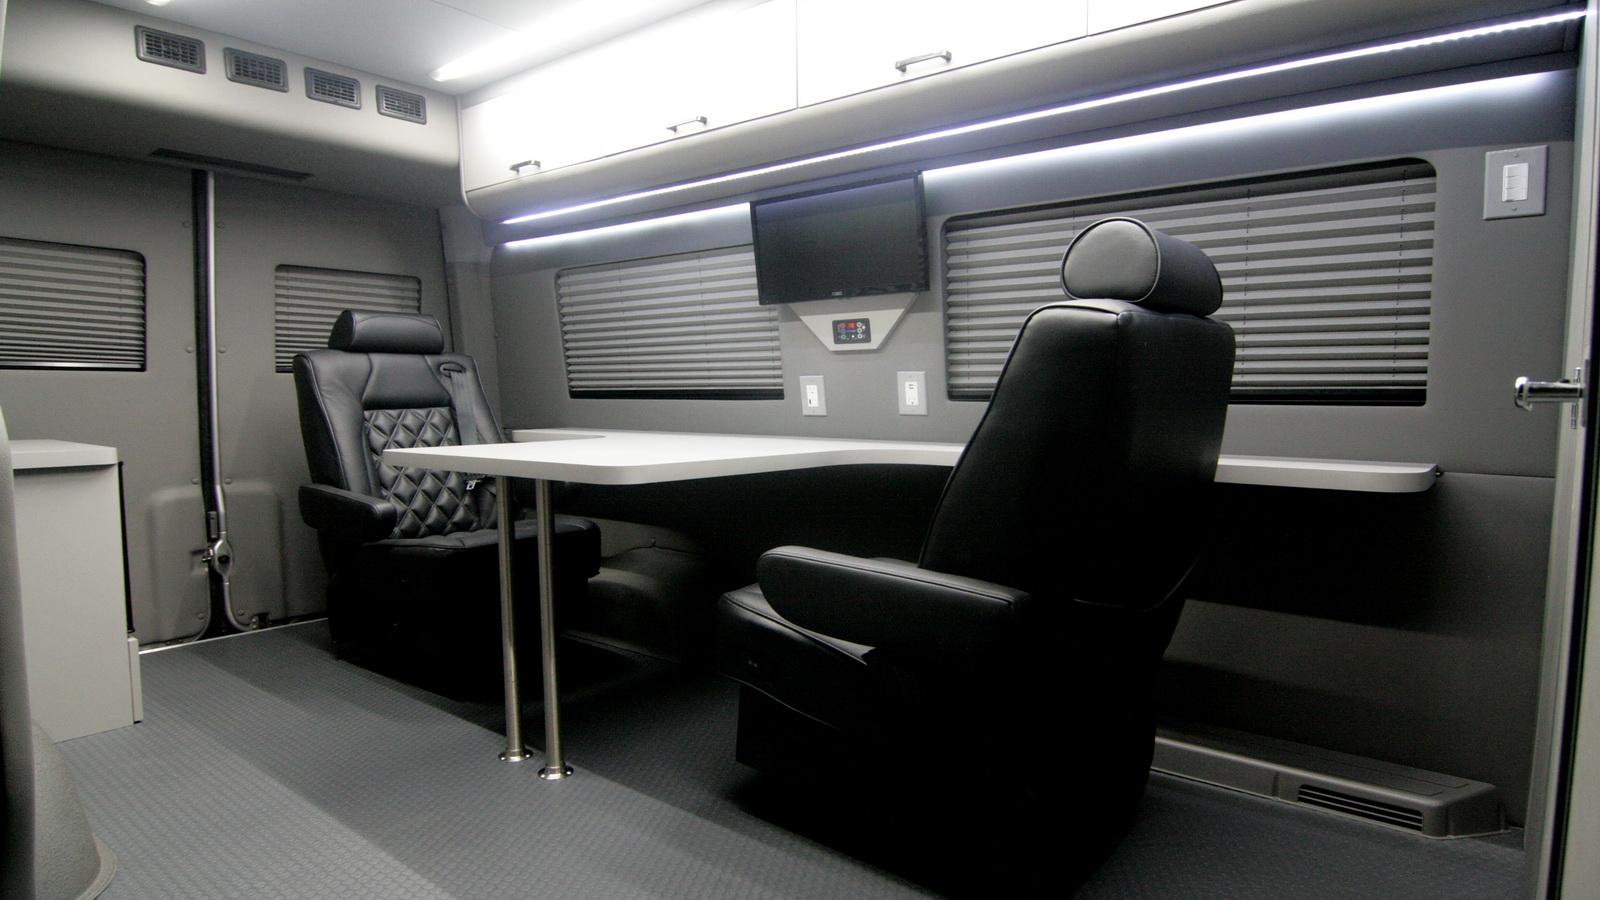 Mercedes Benz Sprinter >> Mobile Office Conversion Vans | HQ Custom Design